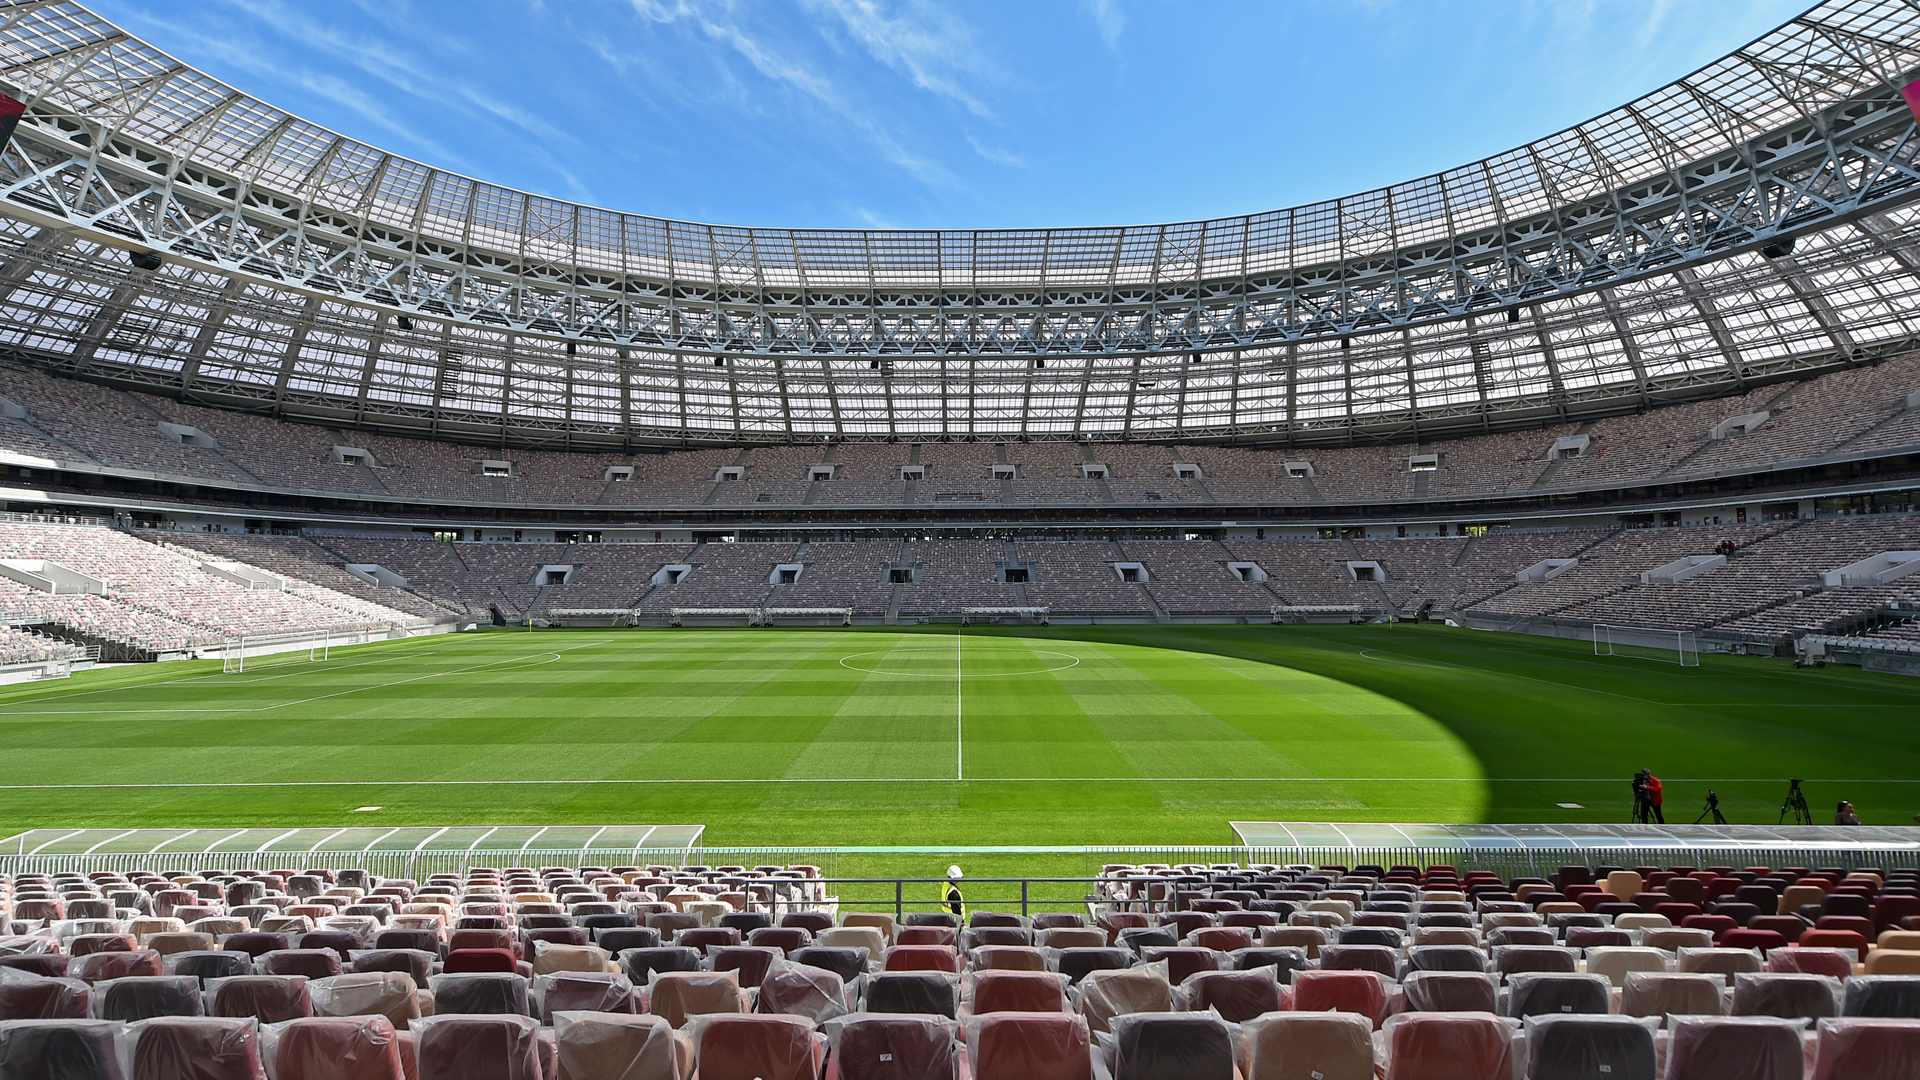 WM 2018 Russland Stadion Moskau Luzhniki